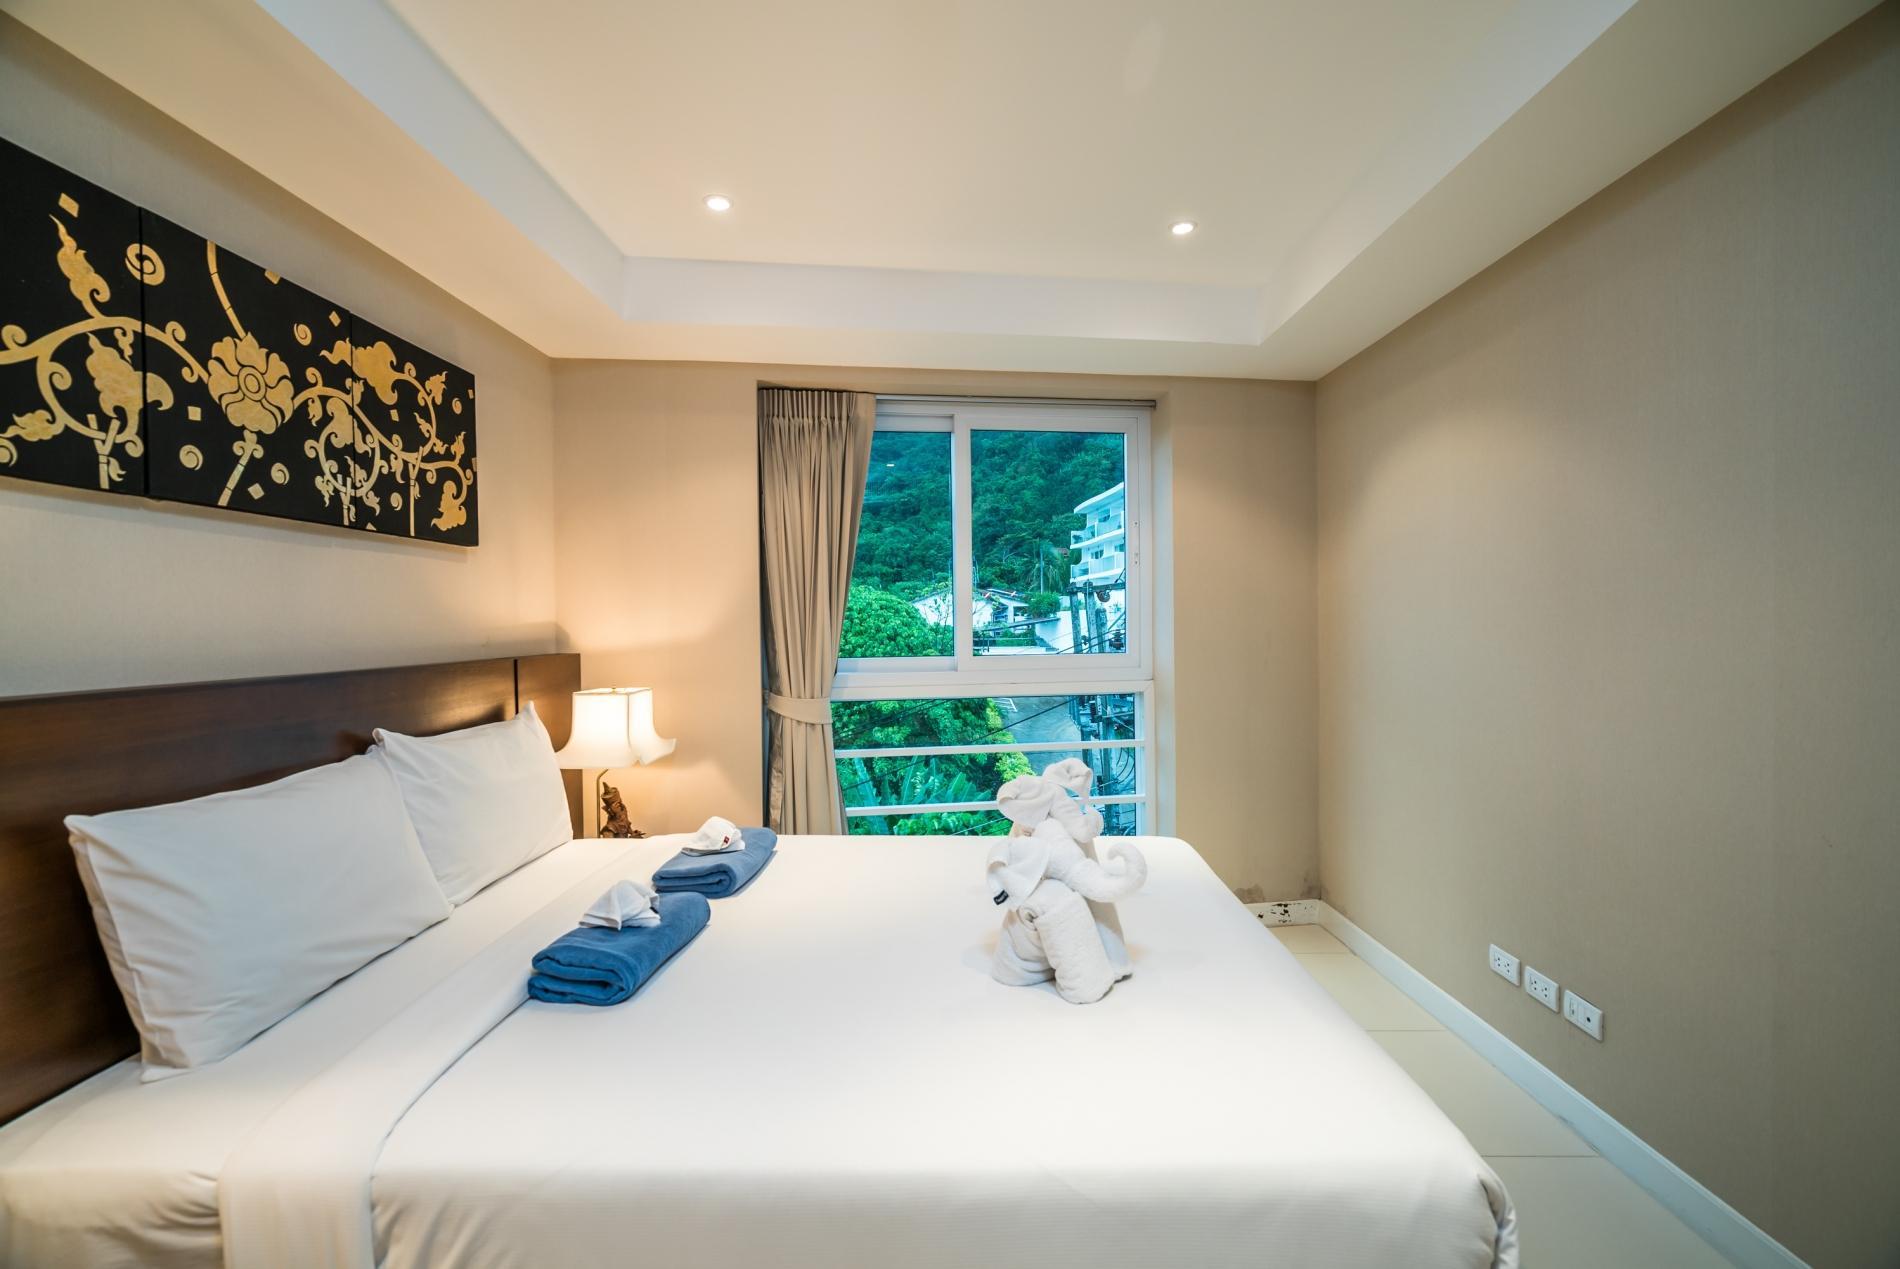 Apartment Kata Ocean View condominium - 1 bdr mountain view apartment photo 20390560